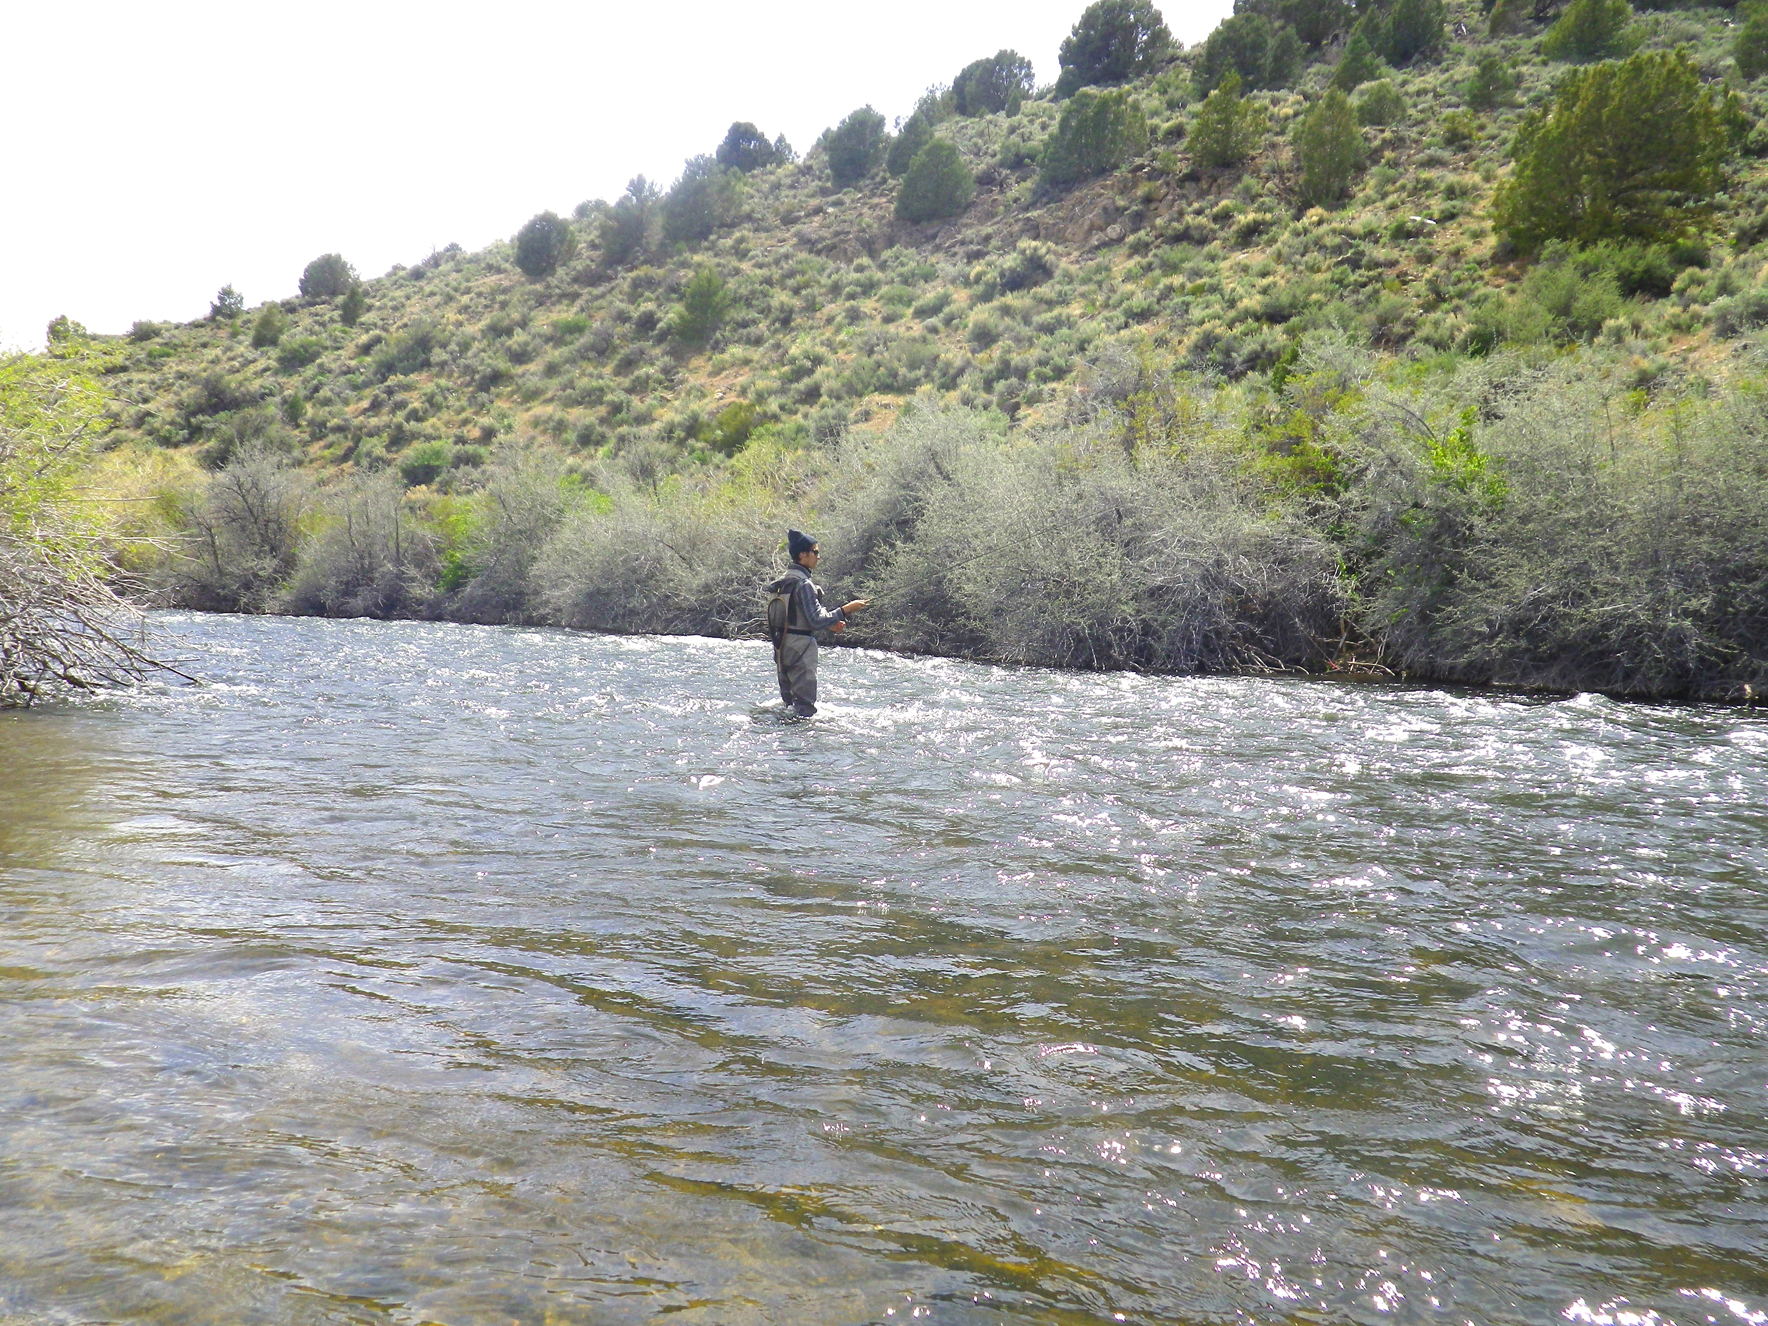 West walker river bridgeport ca planettrout for Walker river fishing